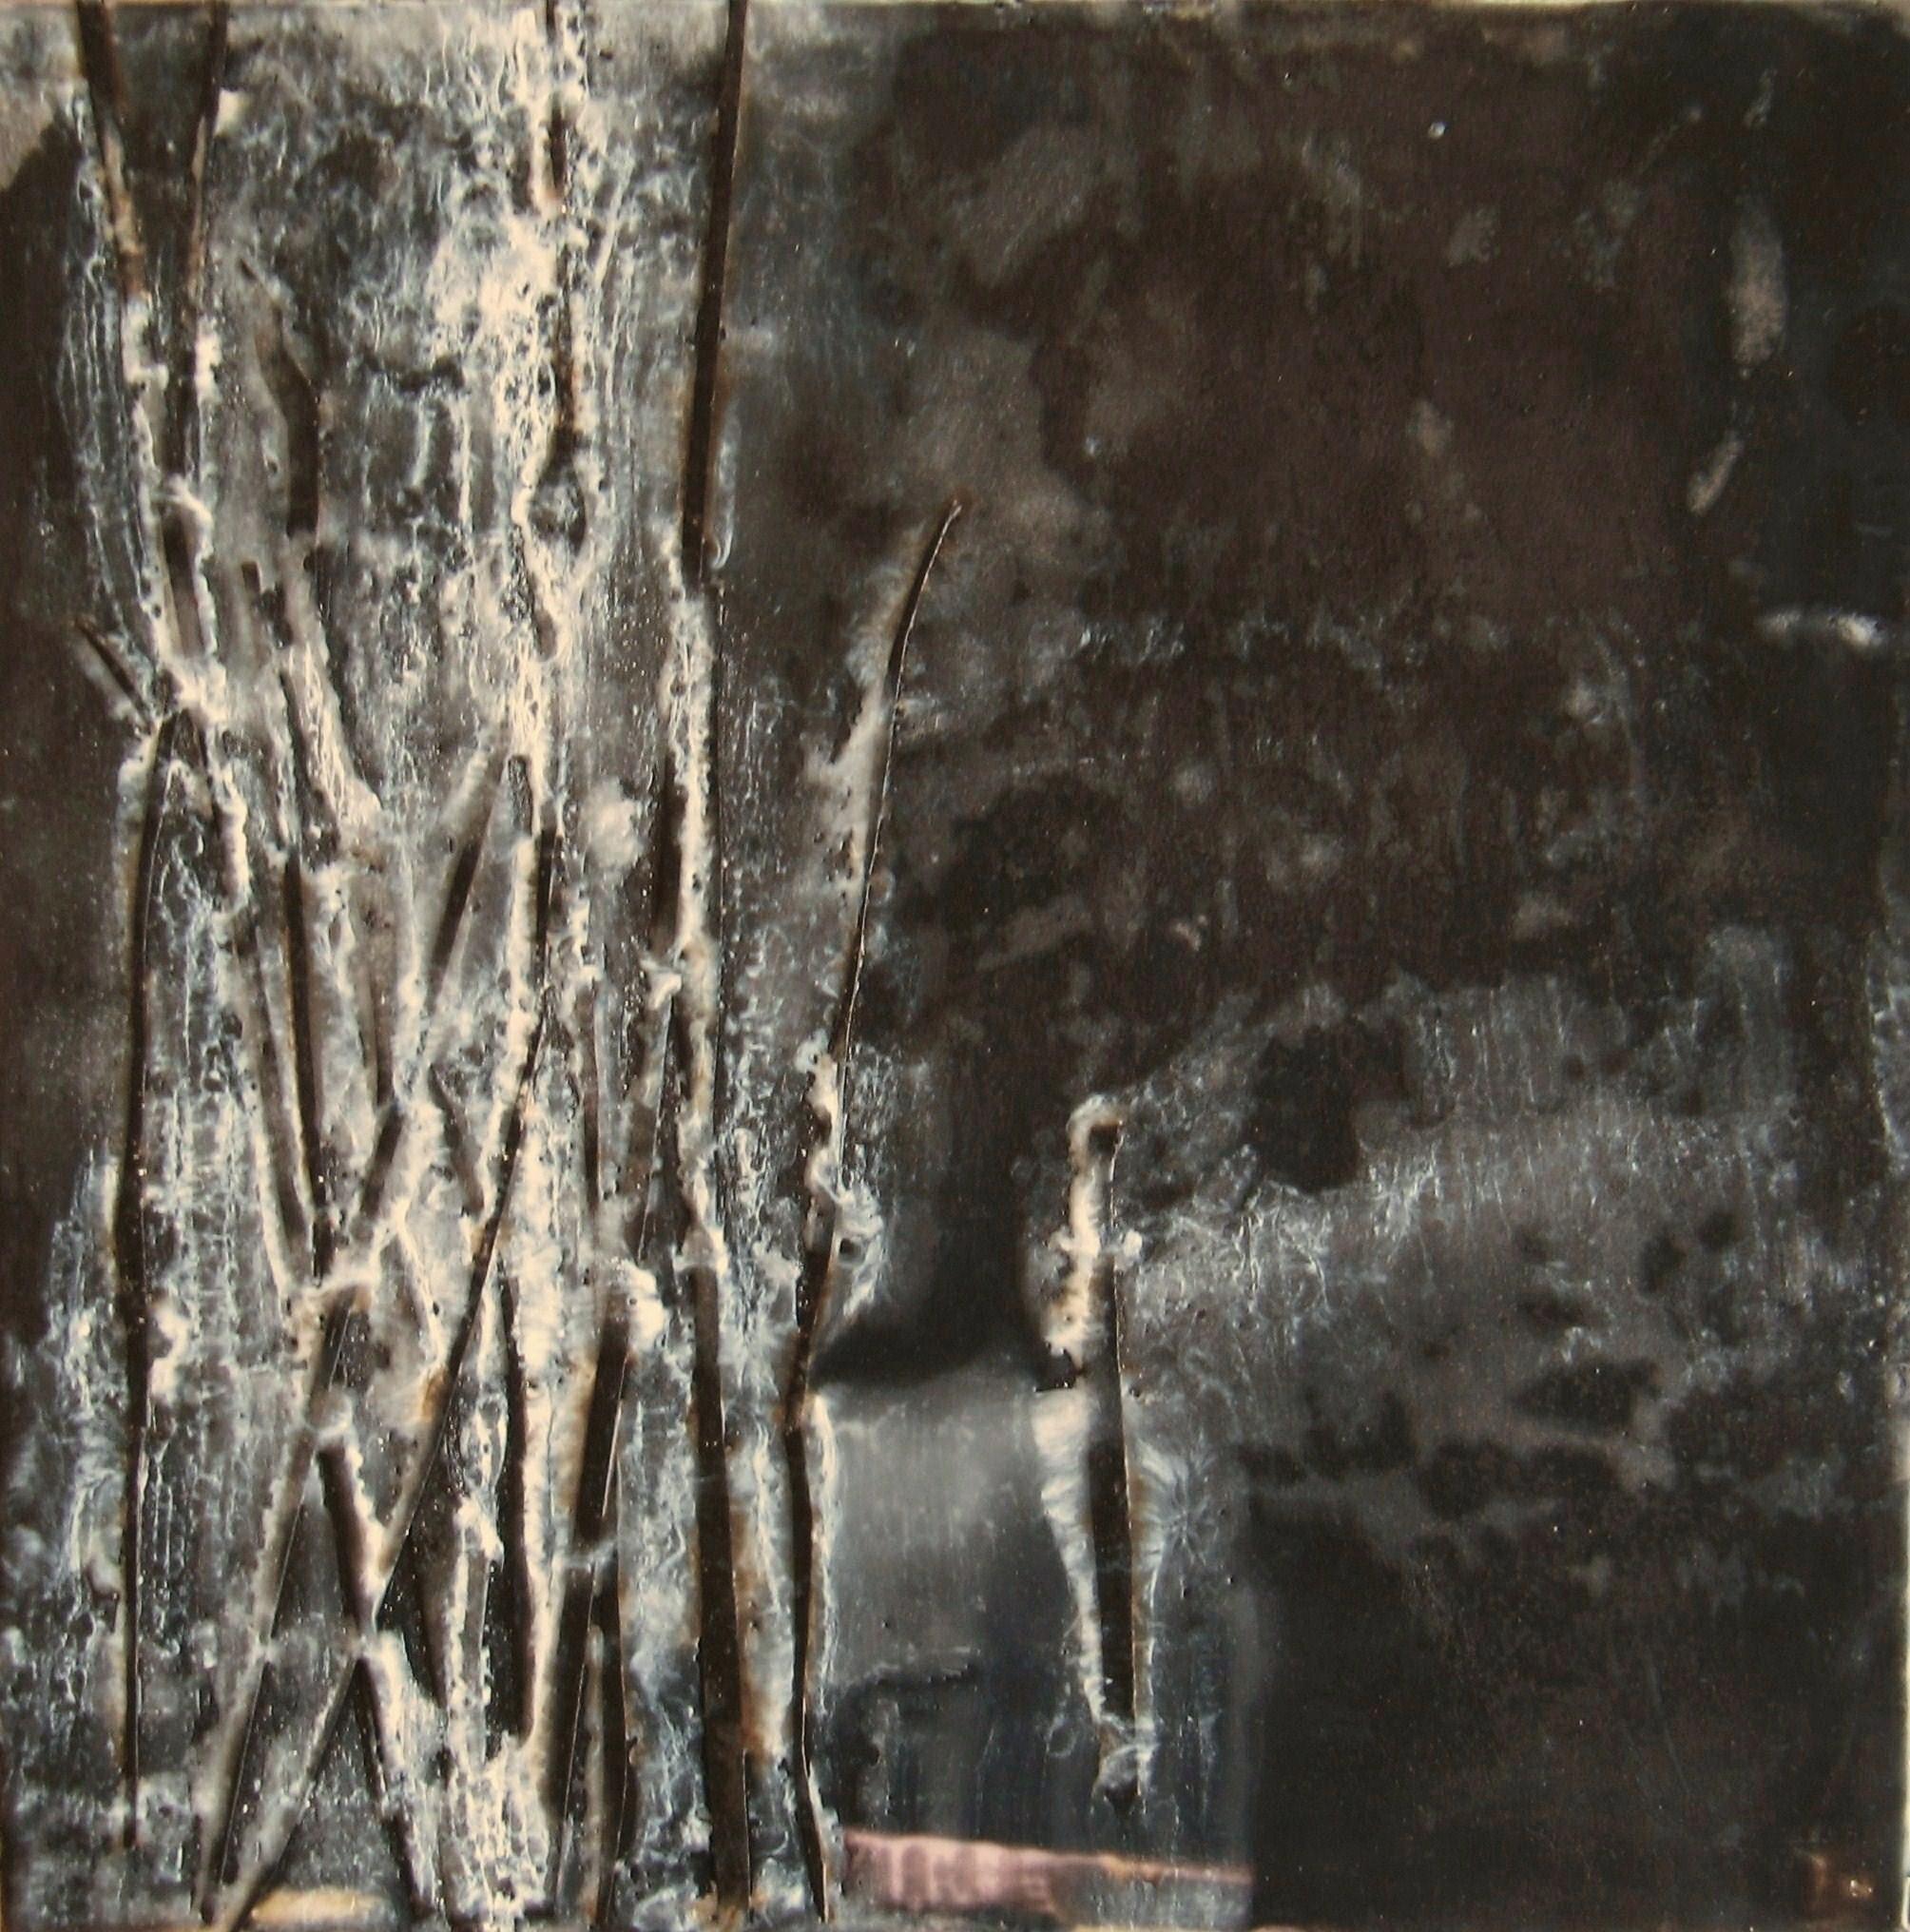 Frozen, 2009 / Encaustic on wood panel, 10 x 10 / Sold